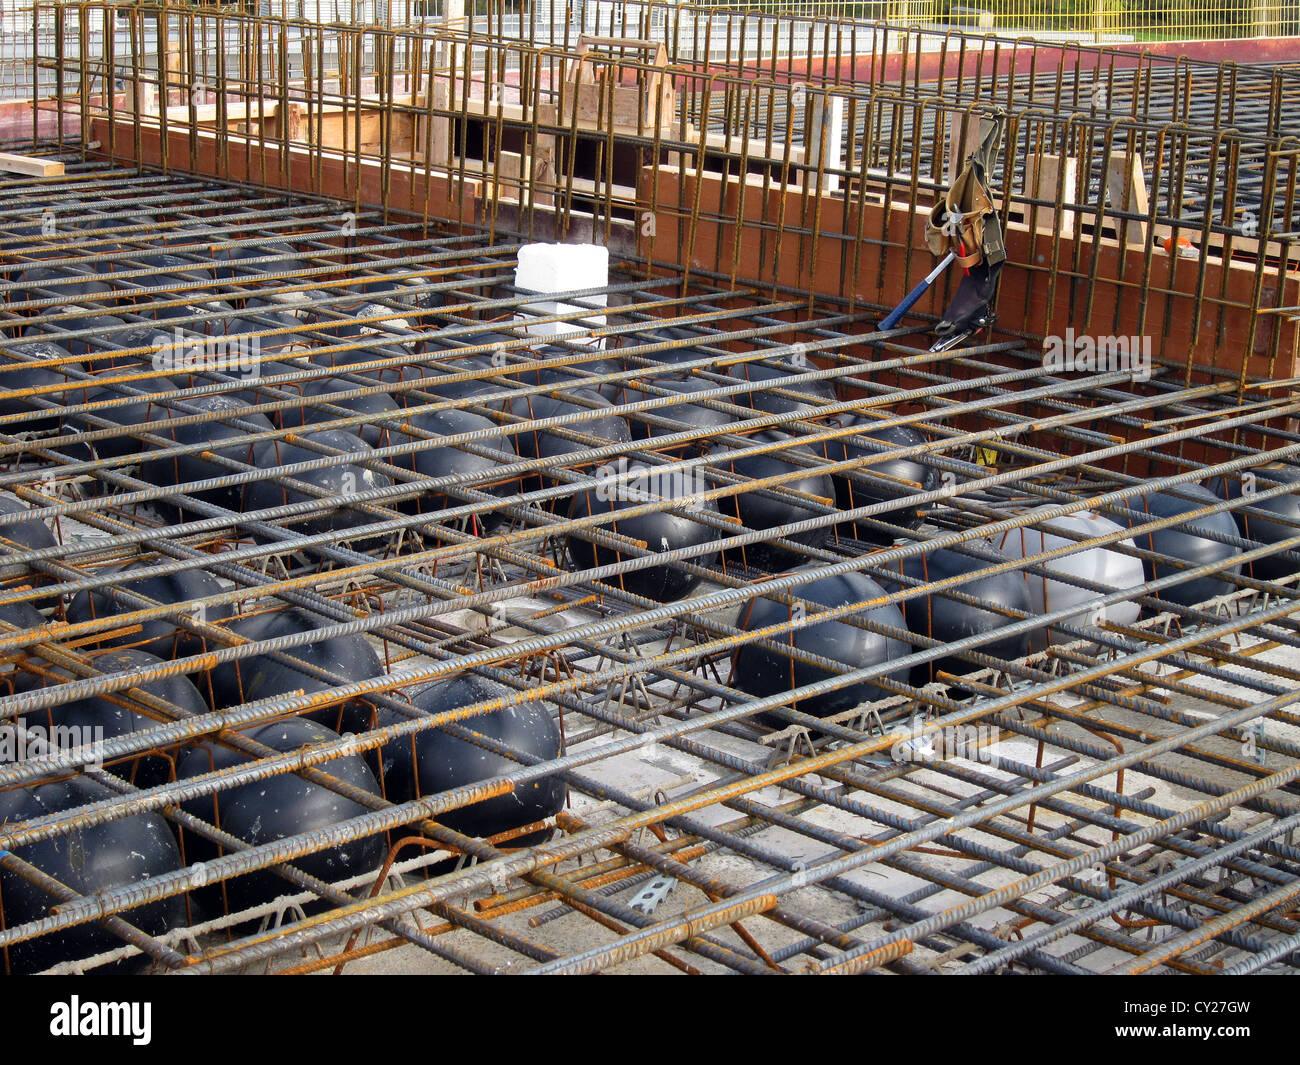 Concrete Slab Construction : Construction of a concrete slab using light weight balls